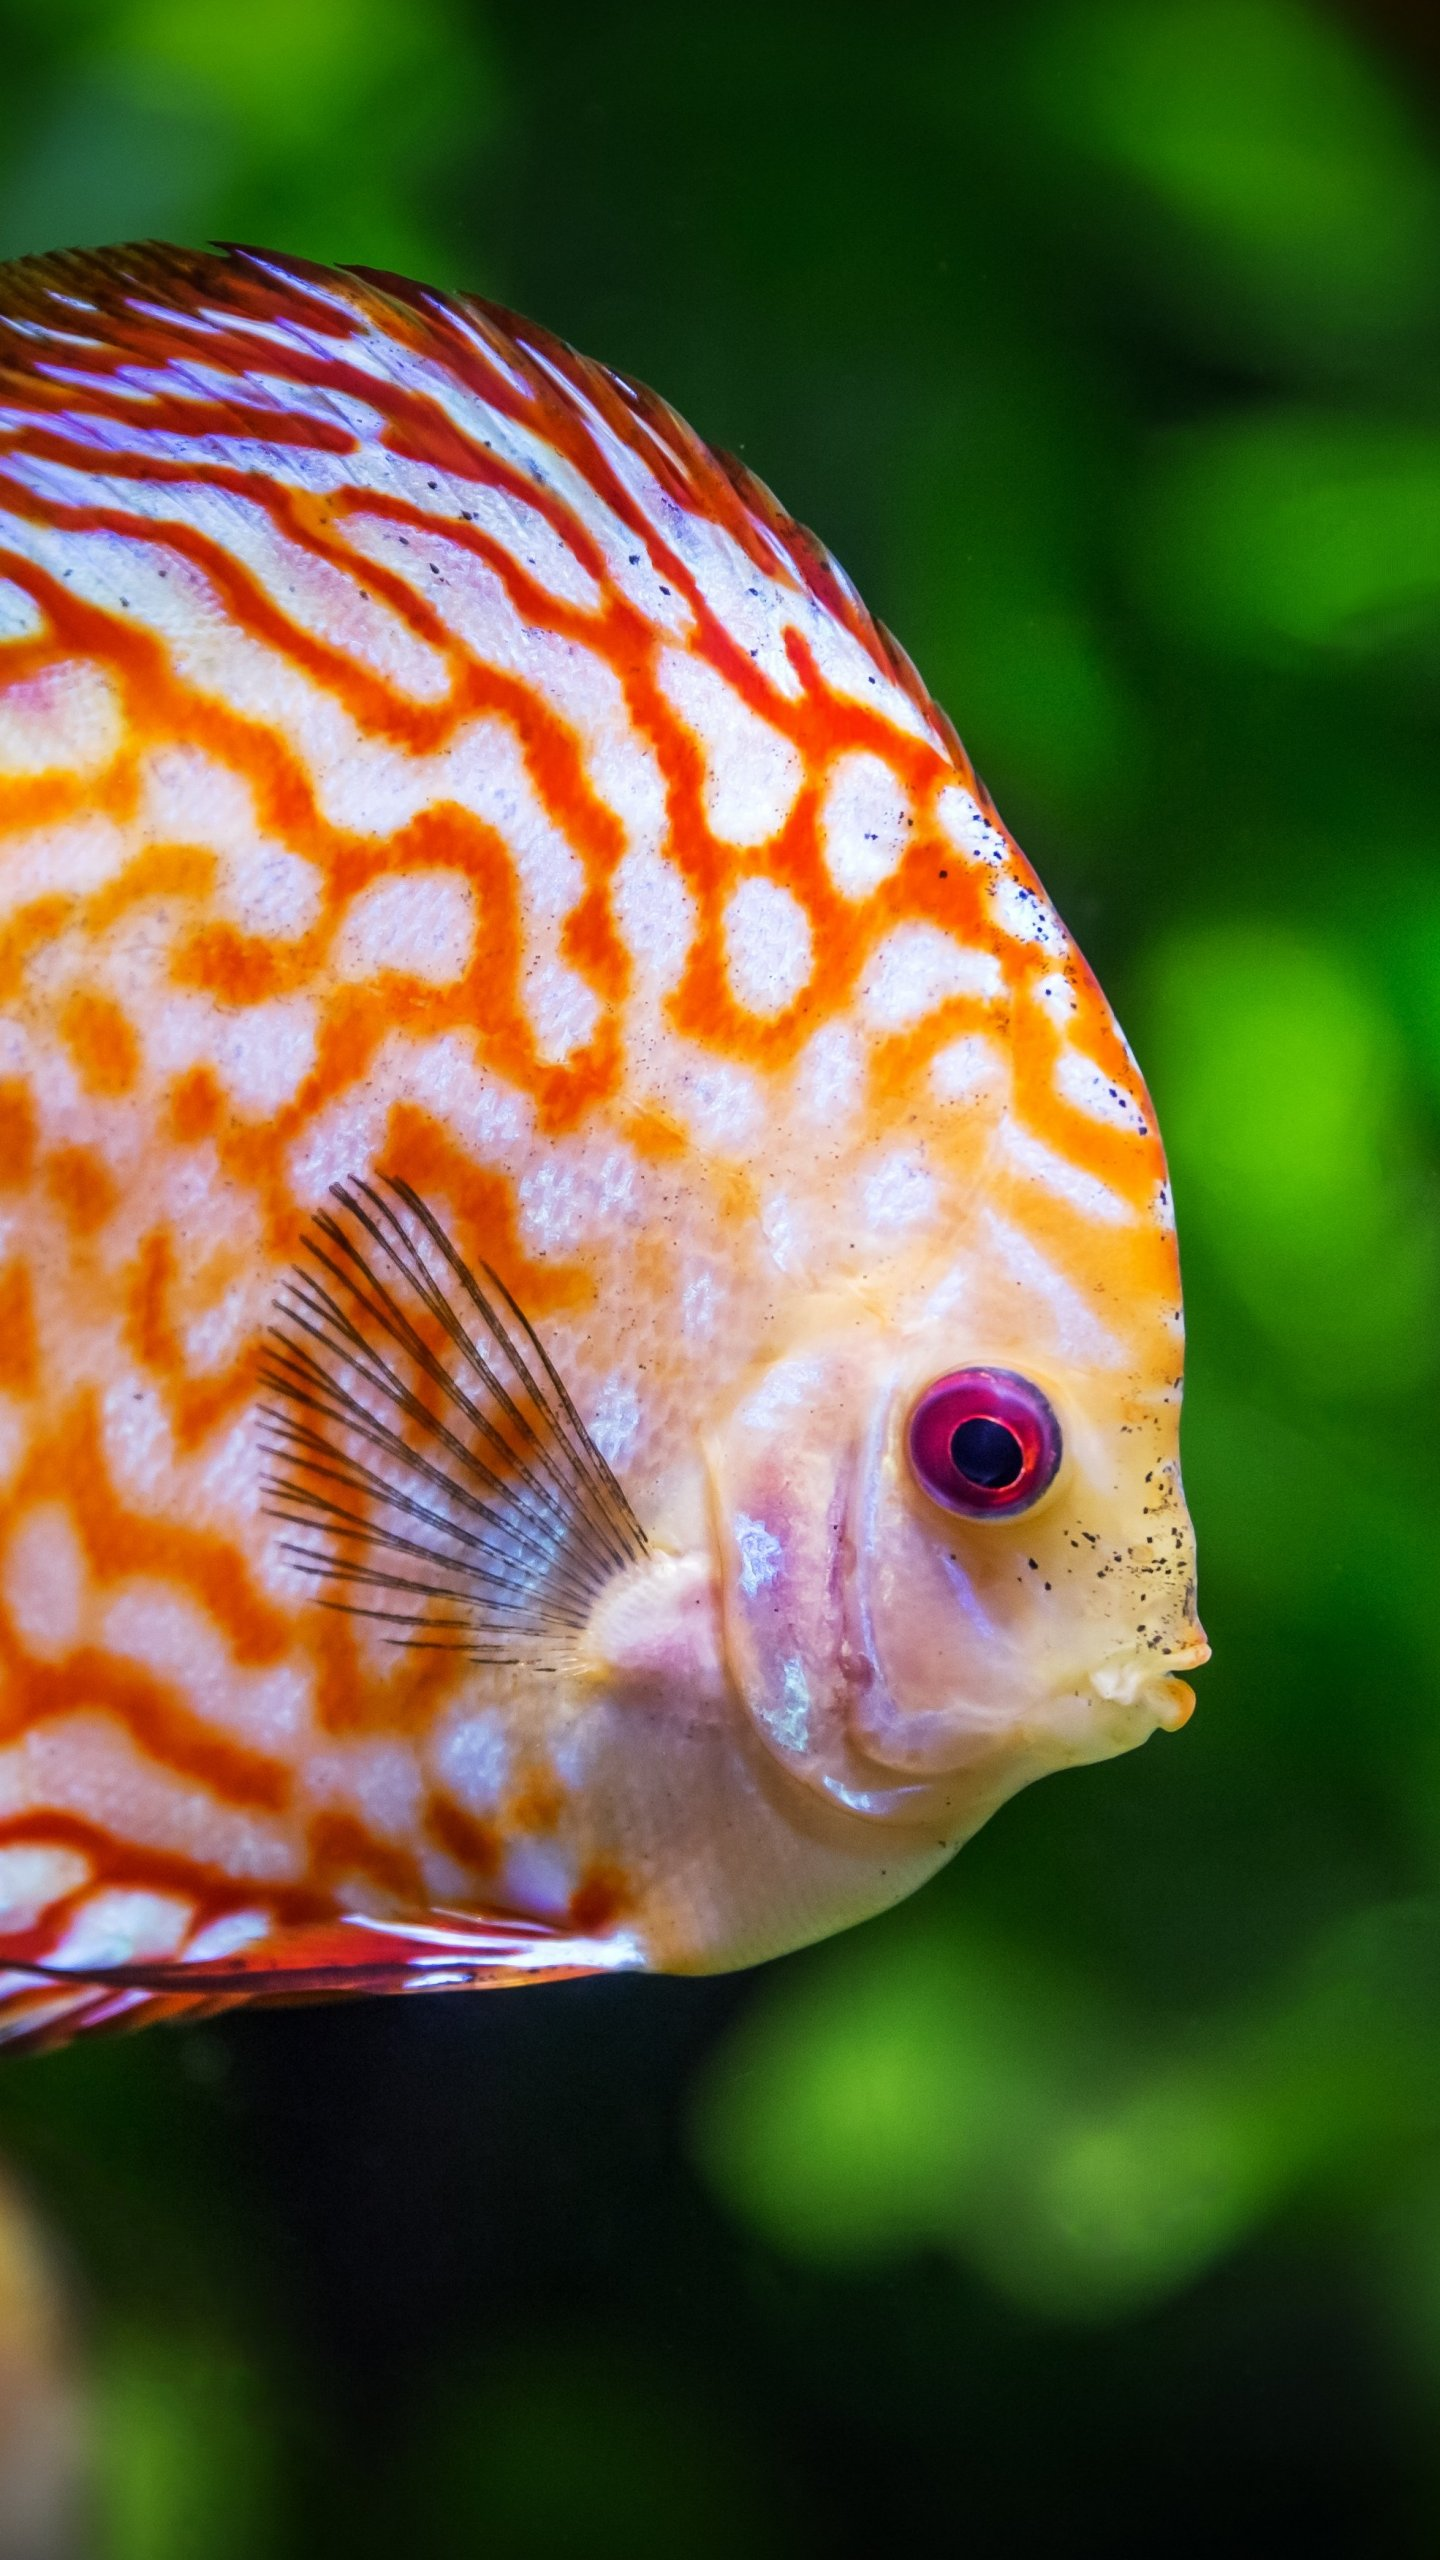 Discus Fish Underwater Wallpaper Iphone Android Desktop